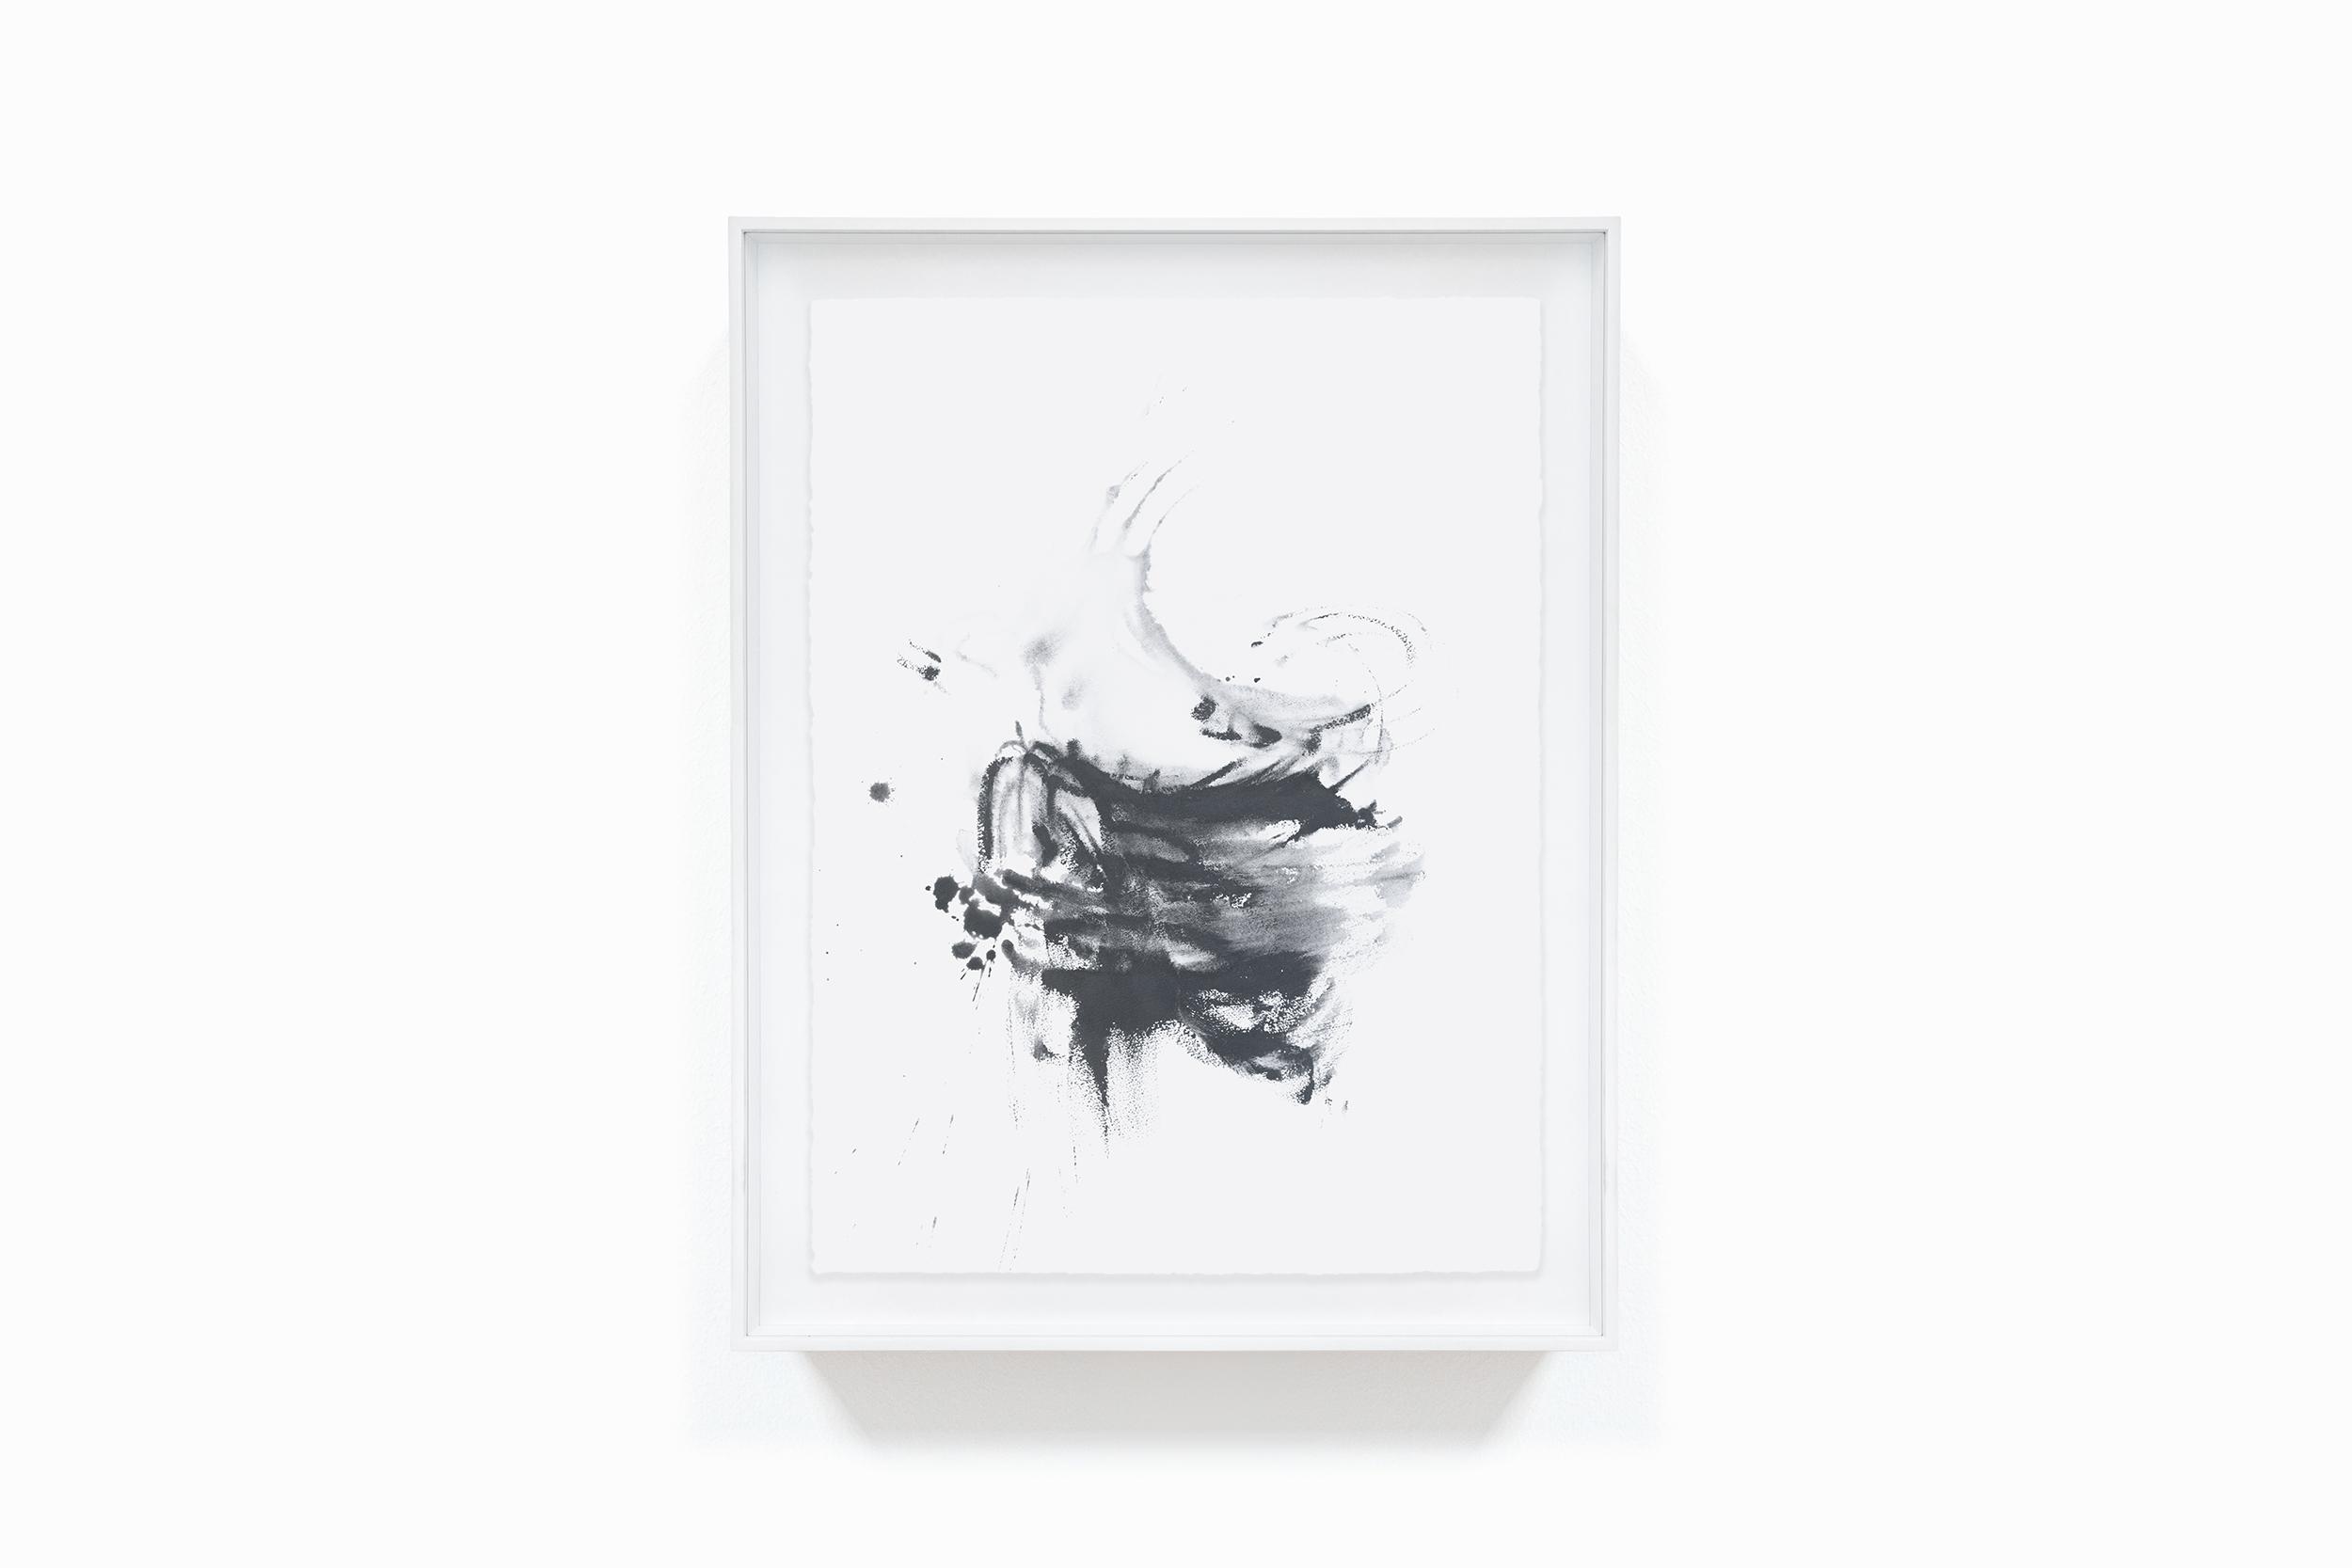 101+Andre+Gigante+Pintura+Painting+bonjourmolotov+La.jpg